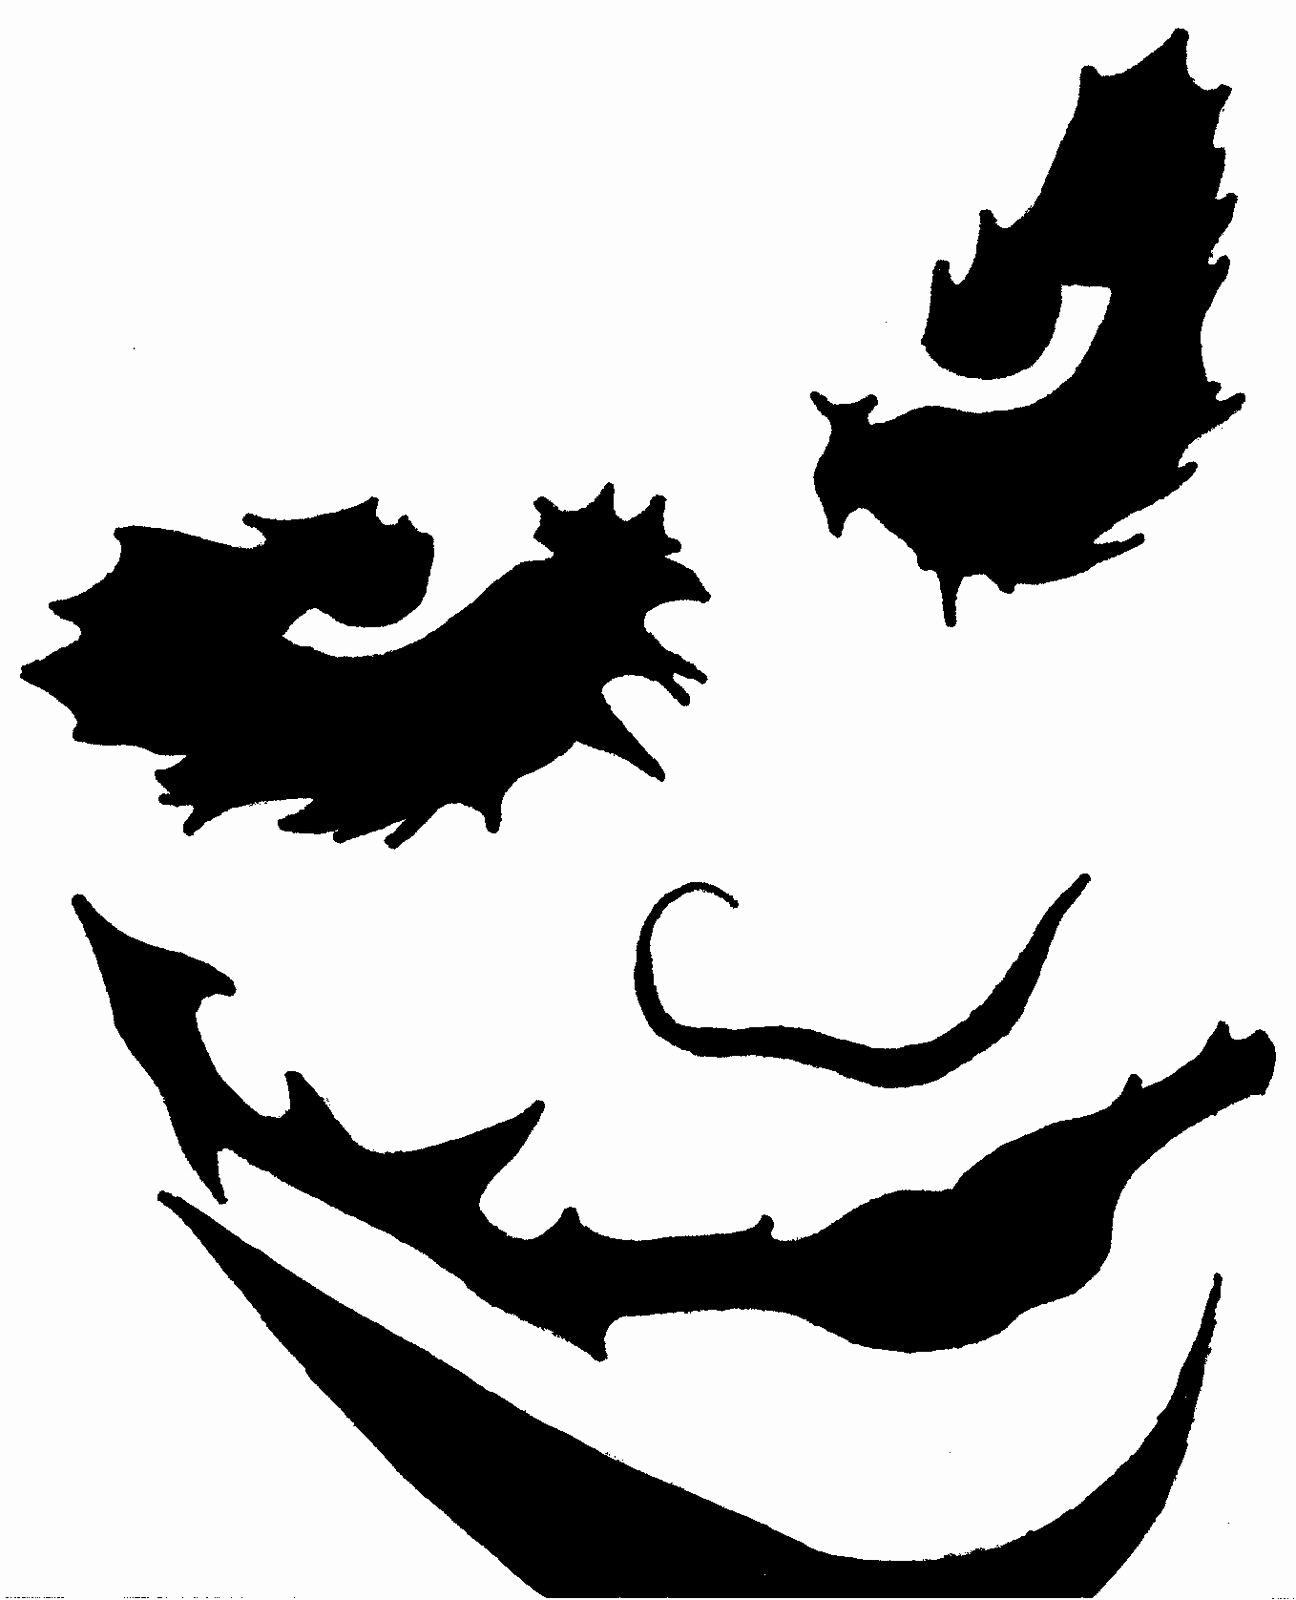 Free Halloween Pumpkin Carving Templates Printable 2018 | Pumpkin - Scary Pumpkin Patterns Free Printable